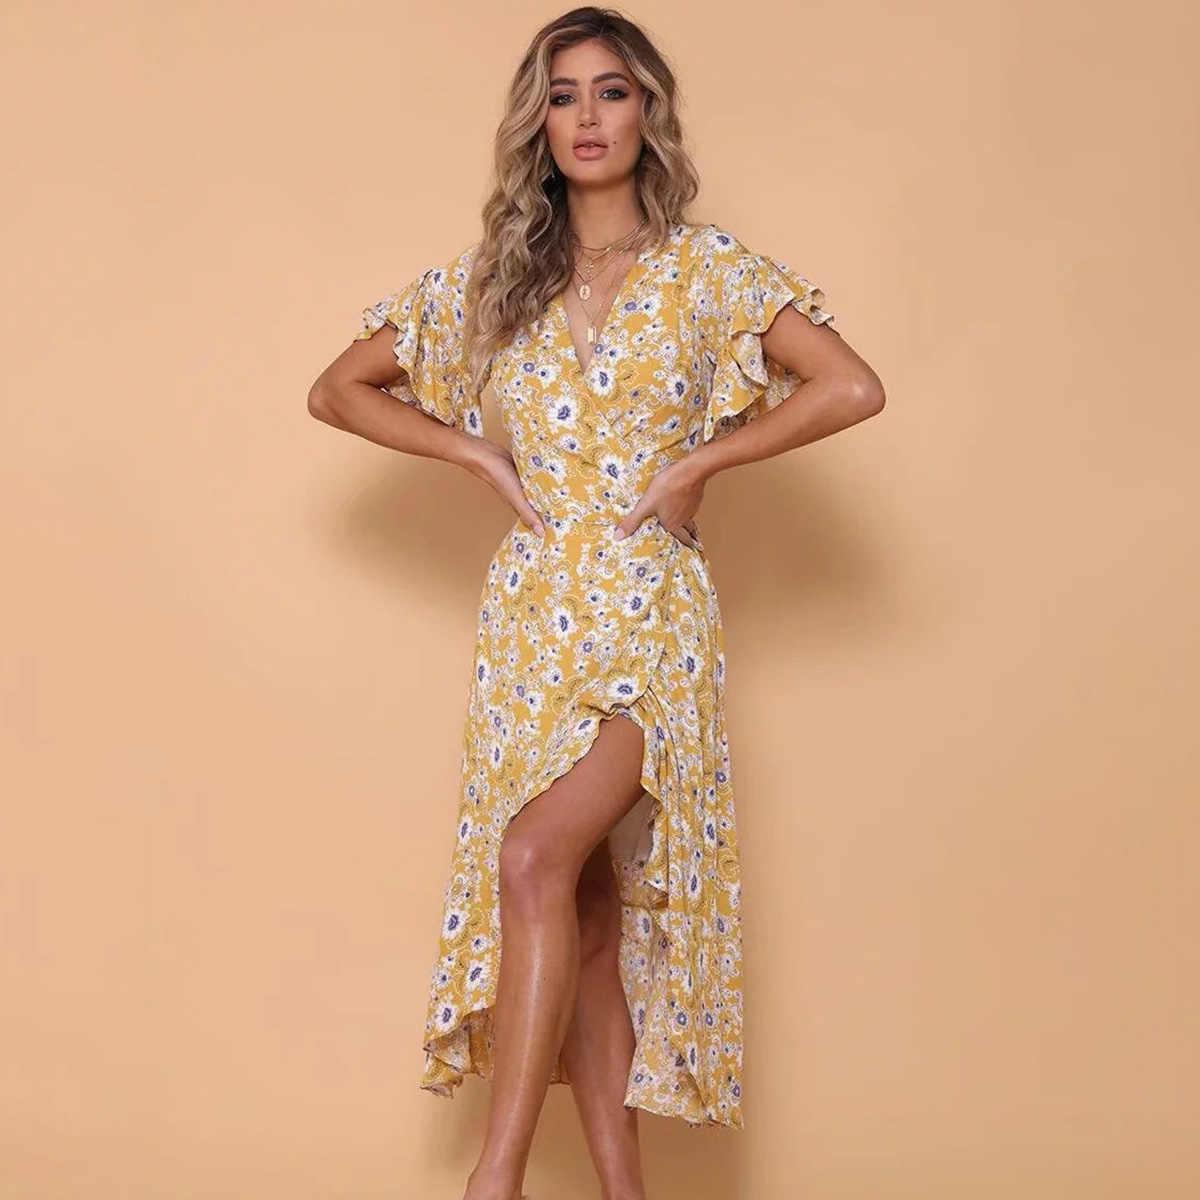 c012f6953a42d Detail Feedback Questions about Retro Locklin Midi Dress Women 2019 ...